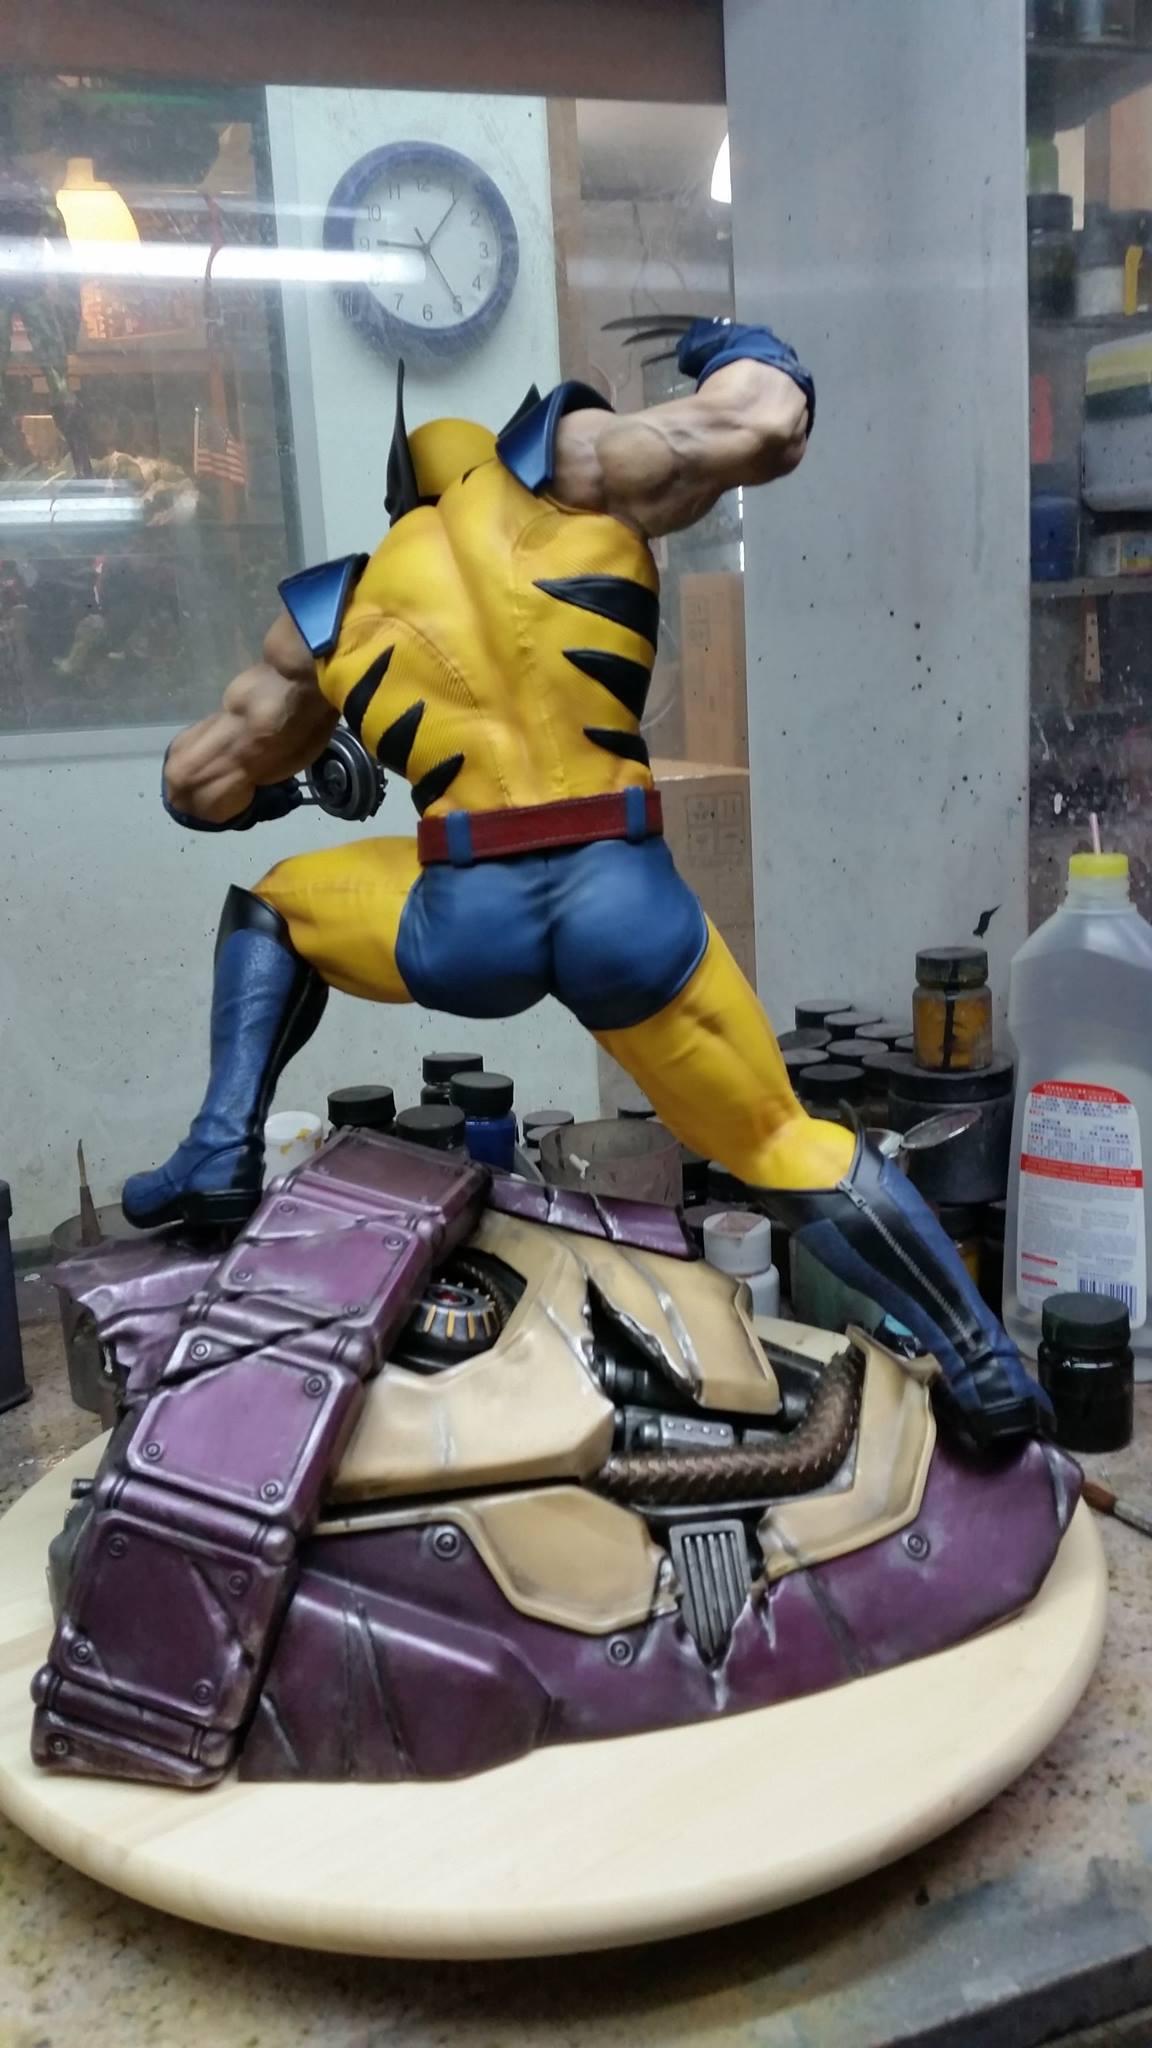 Premium Collectibles : Wolverine - Comics Version - Page 2 346842159874314171090185097935639800247461875890o